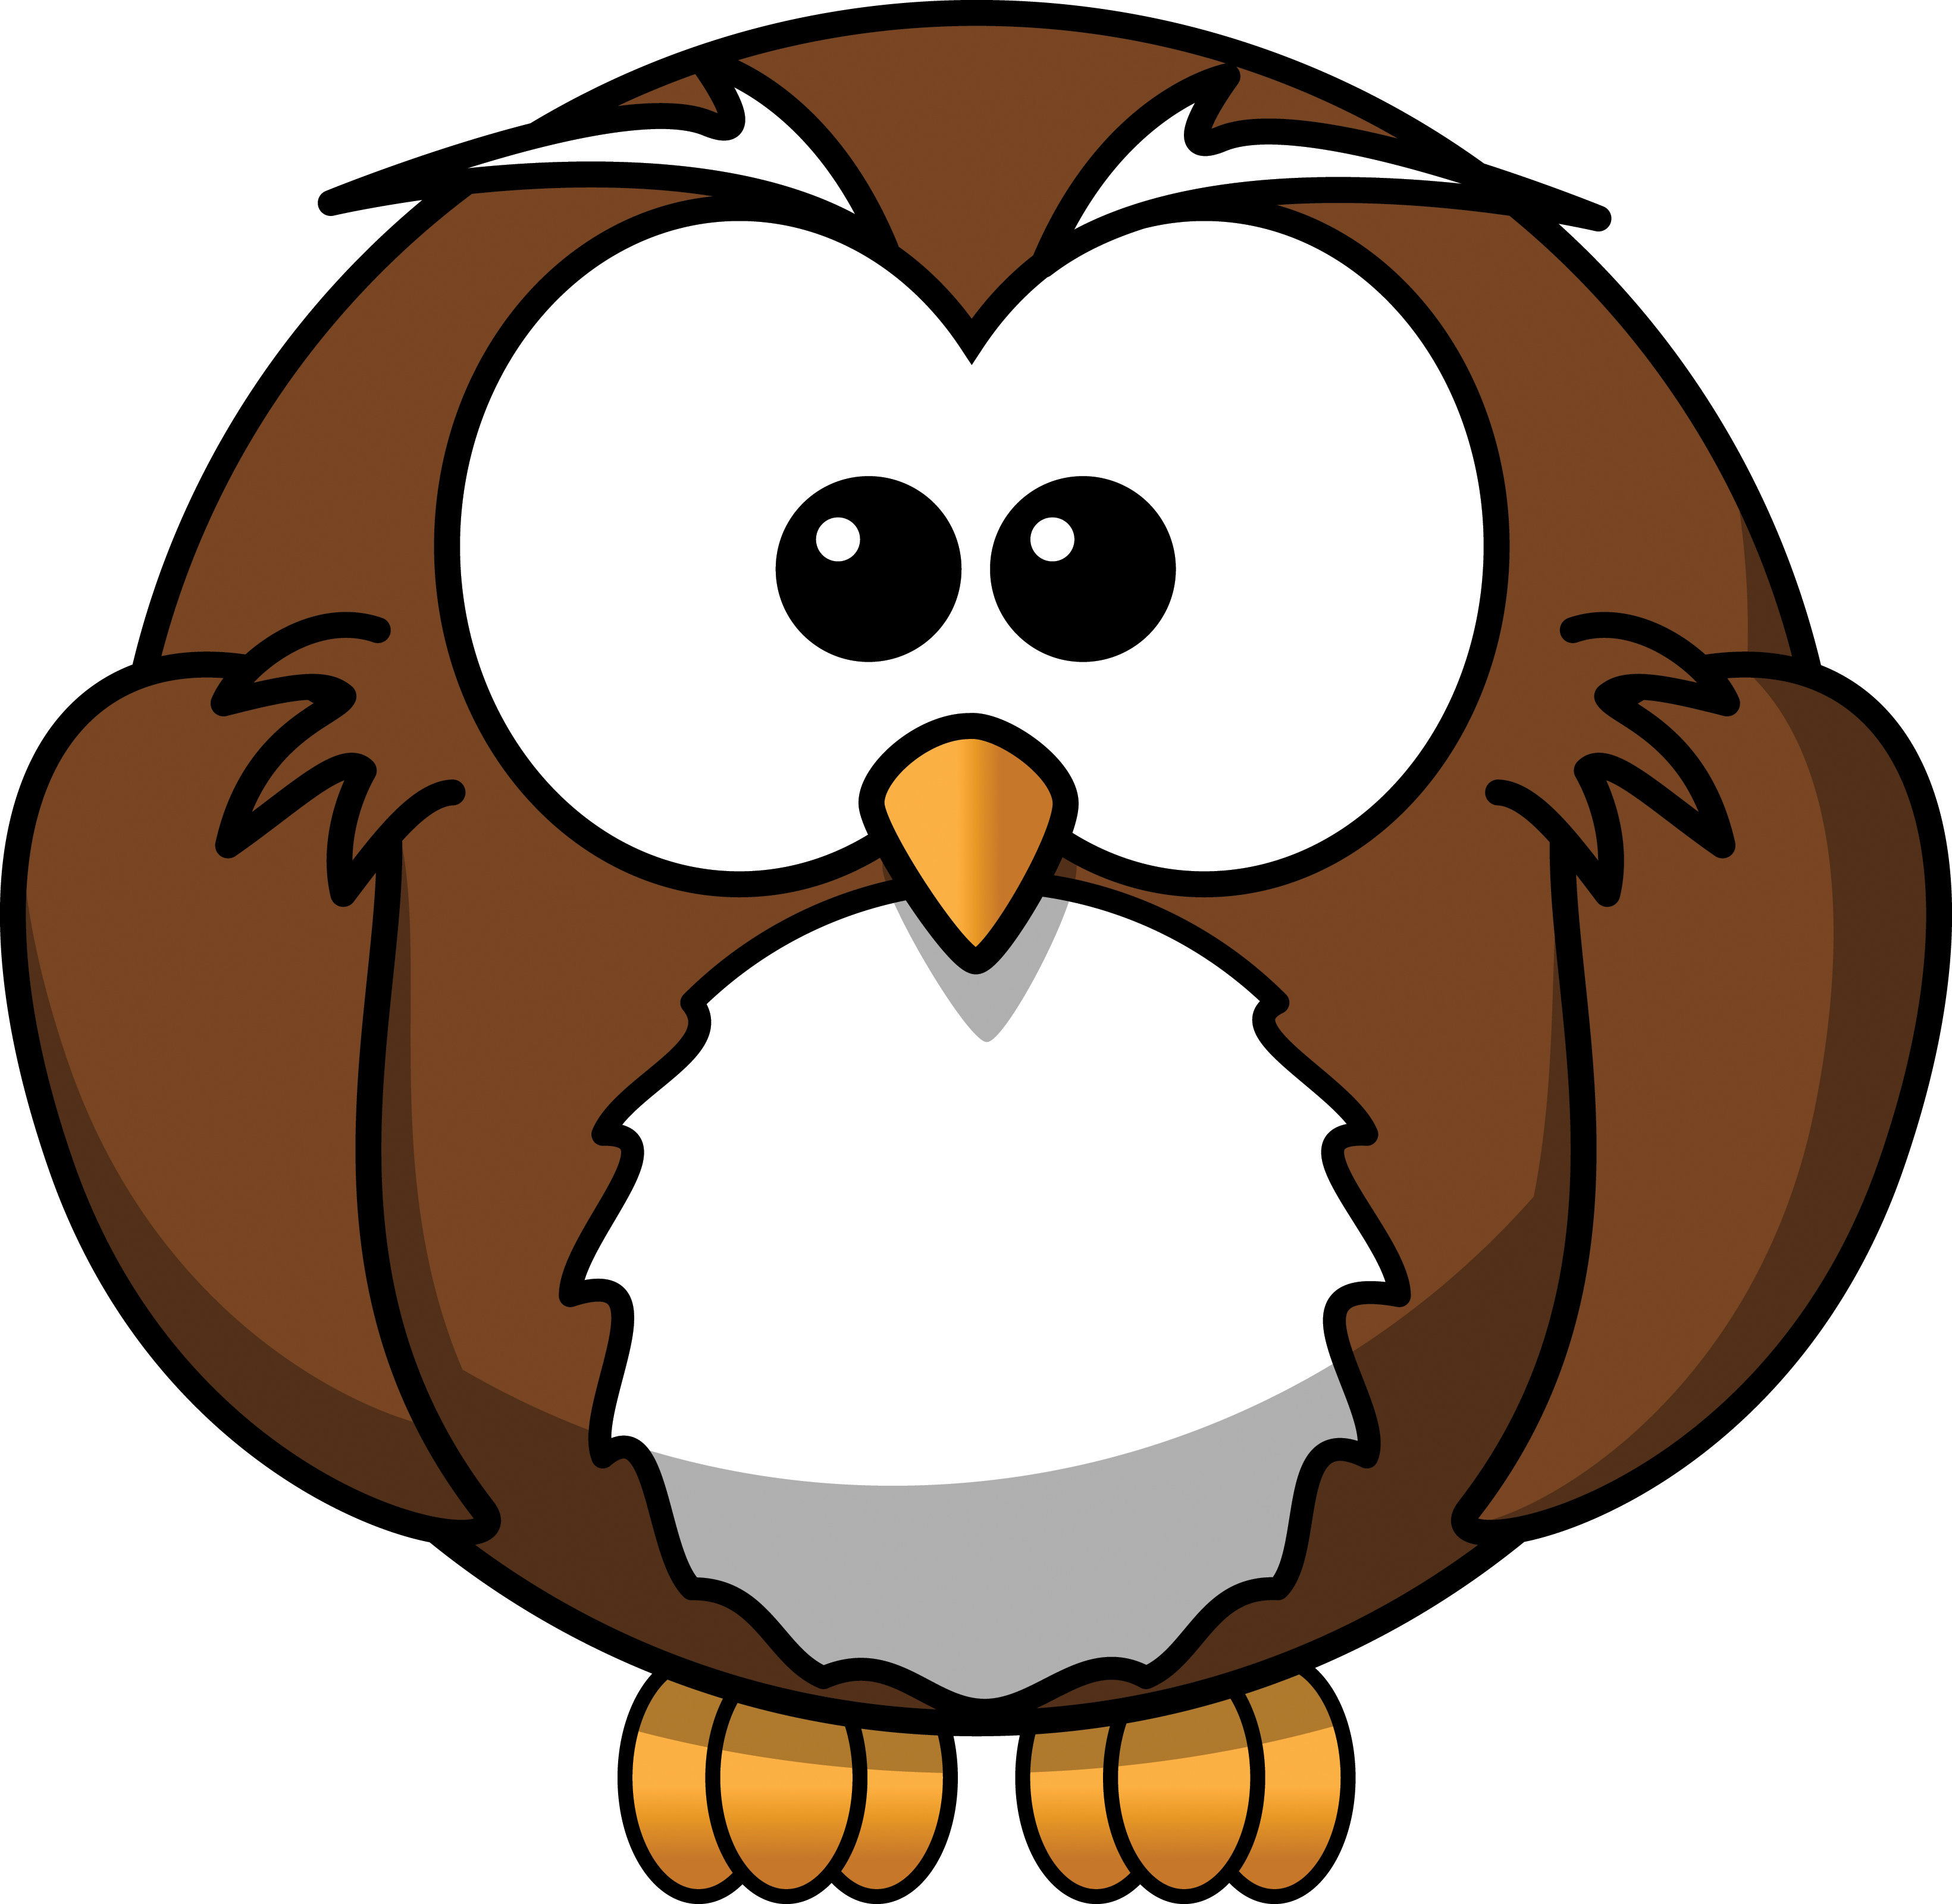 3281x3200 Free Cartoon Owl Clipart